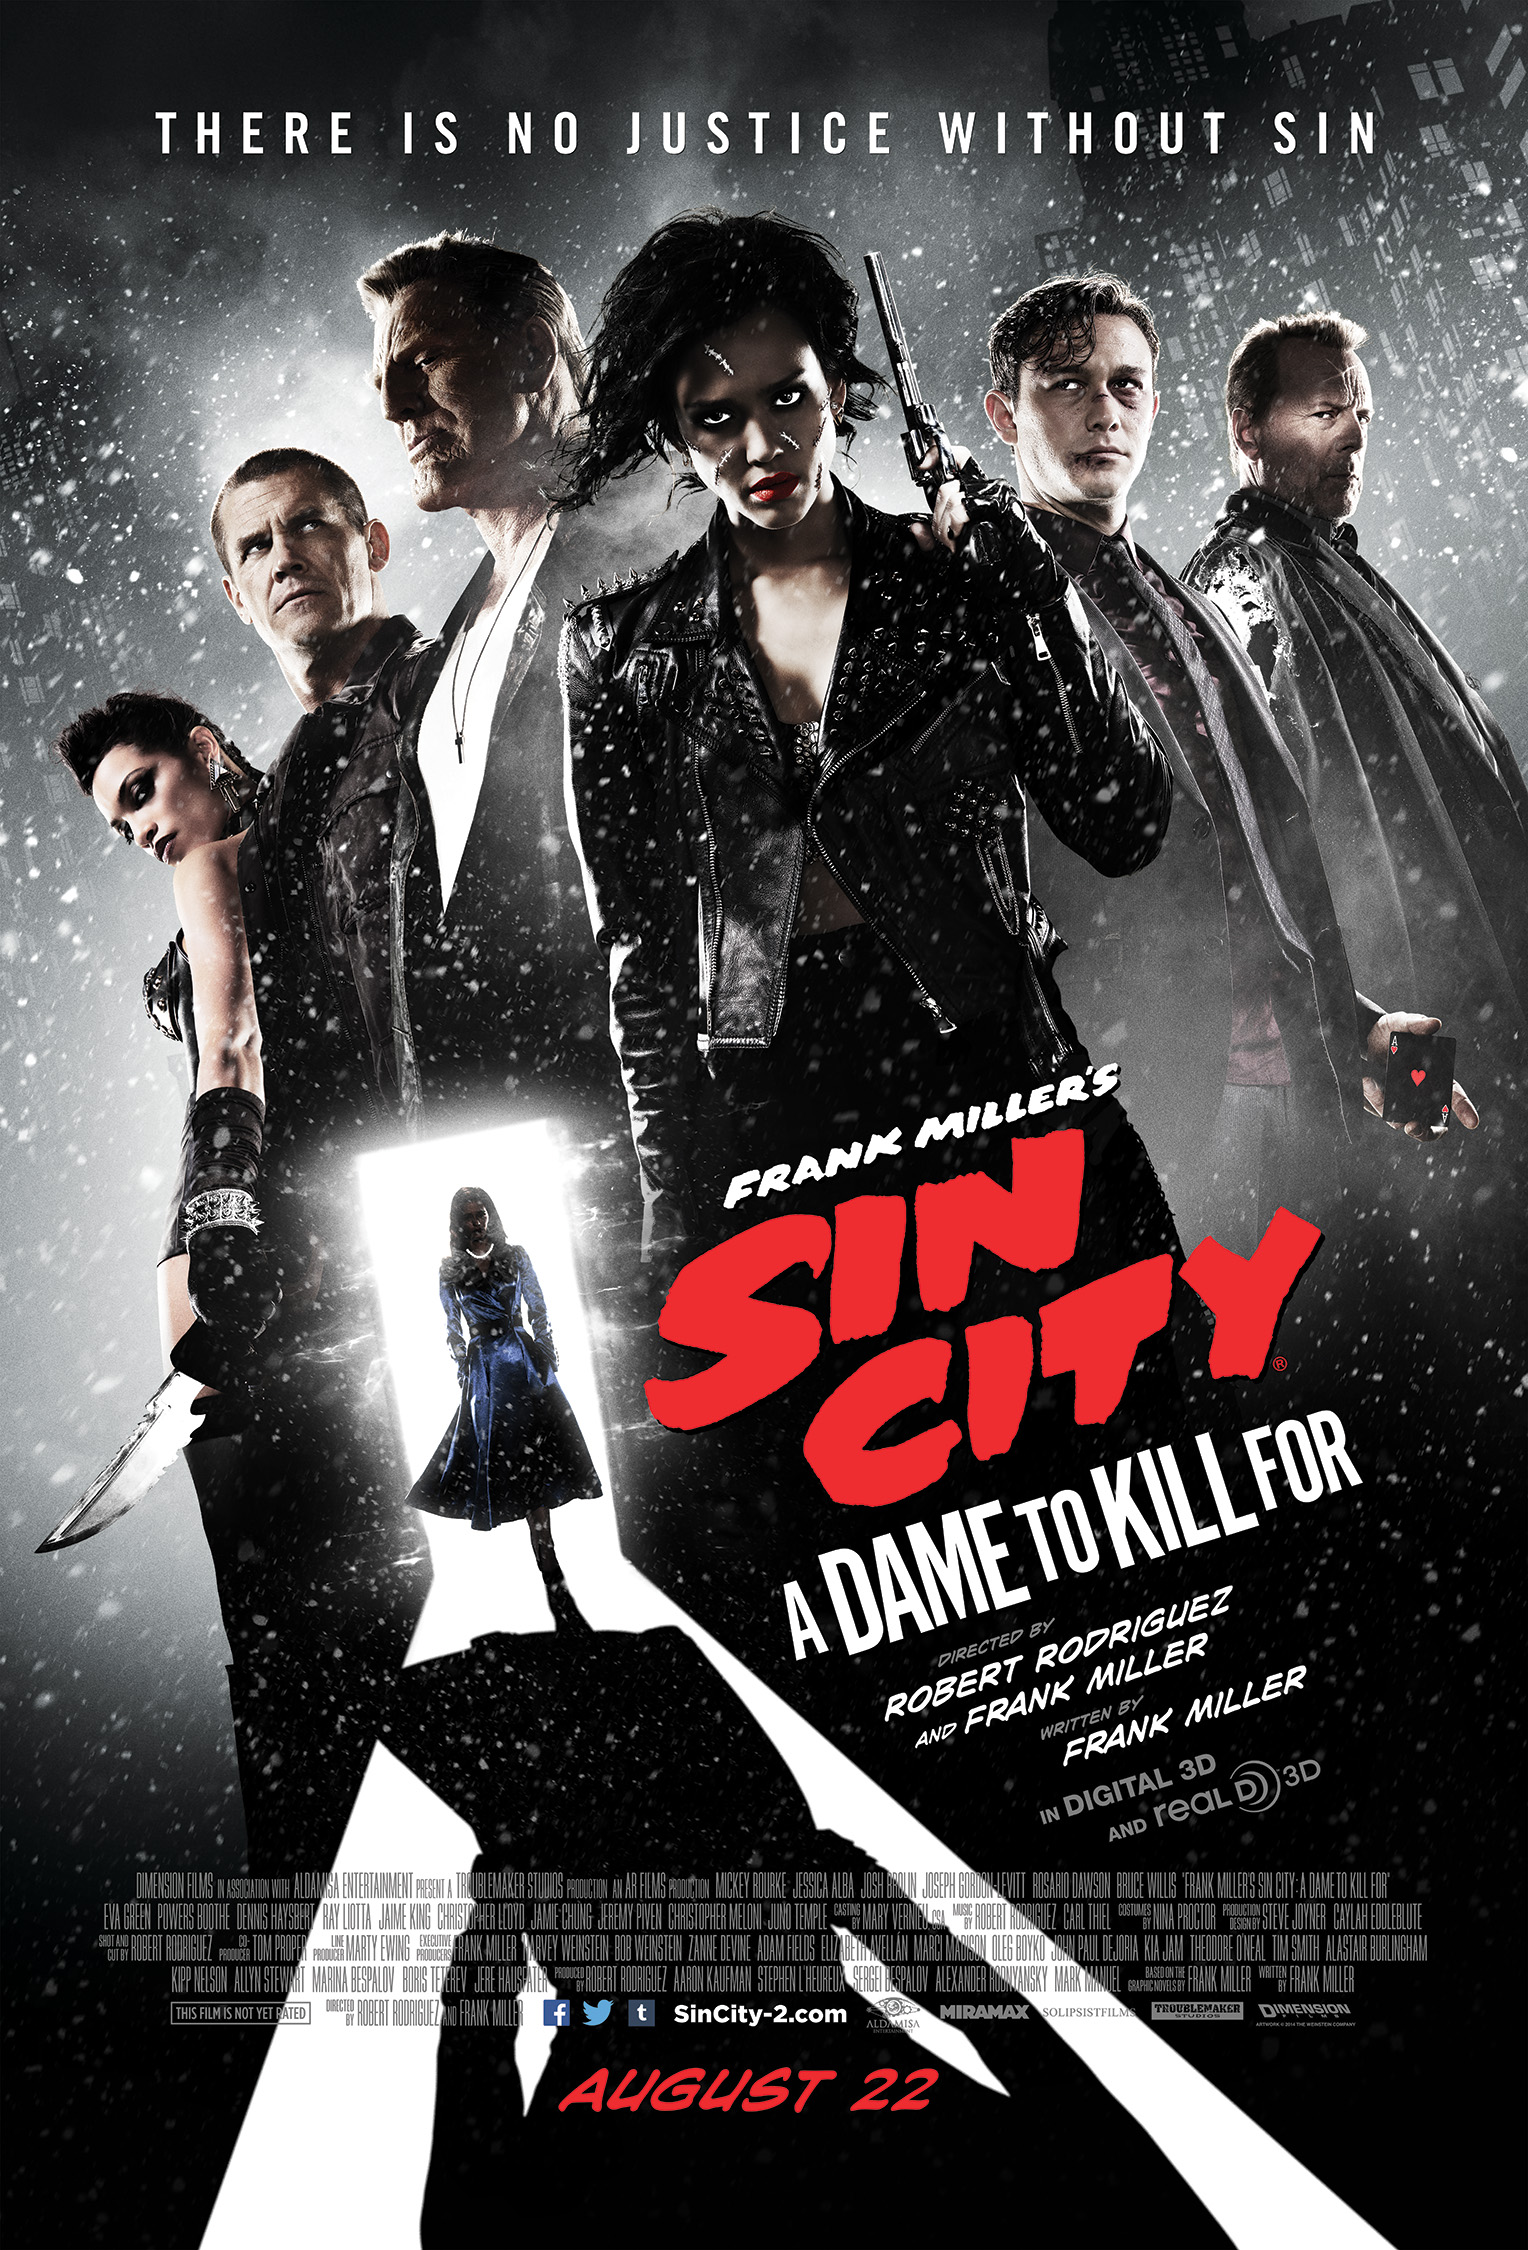 SIN-CITY-1sheet-poster